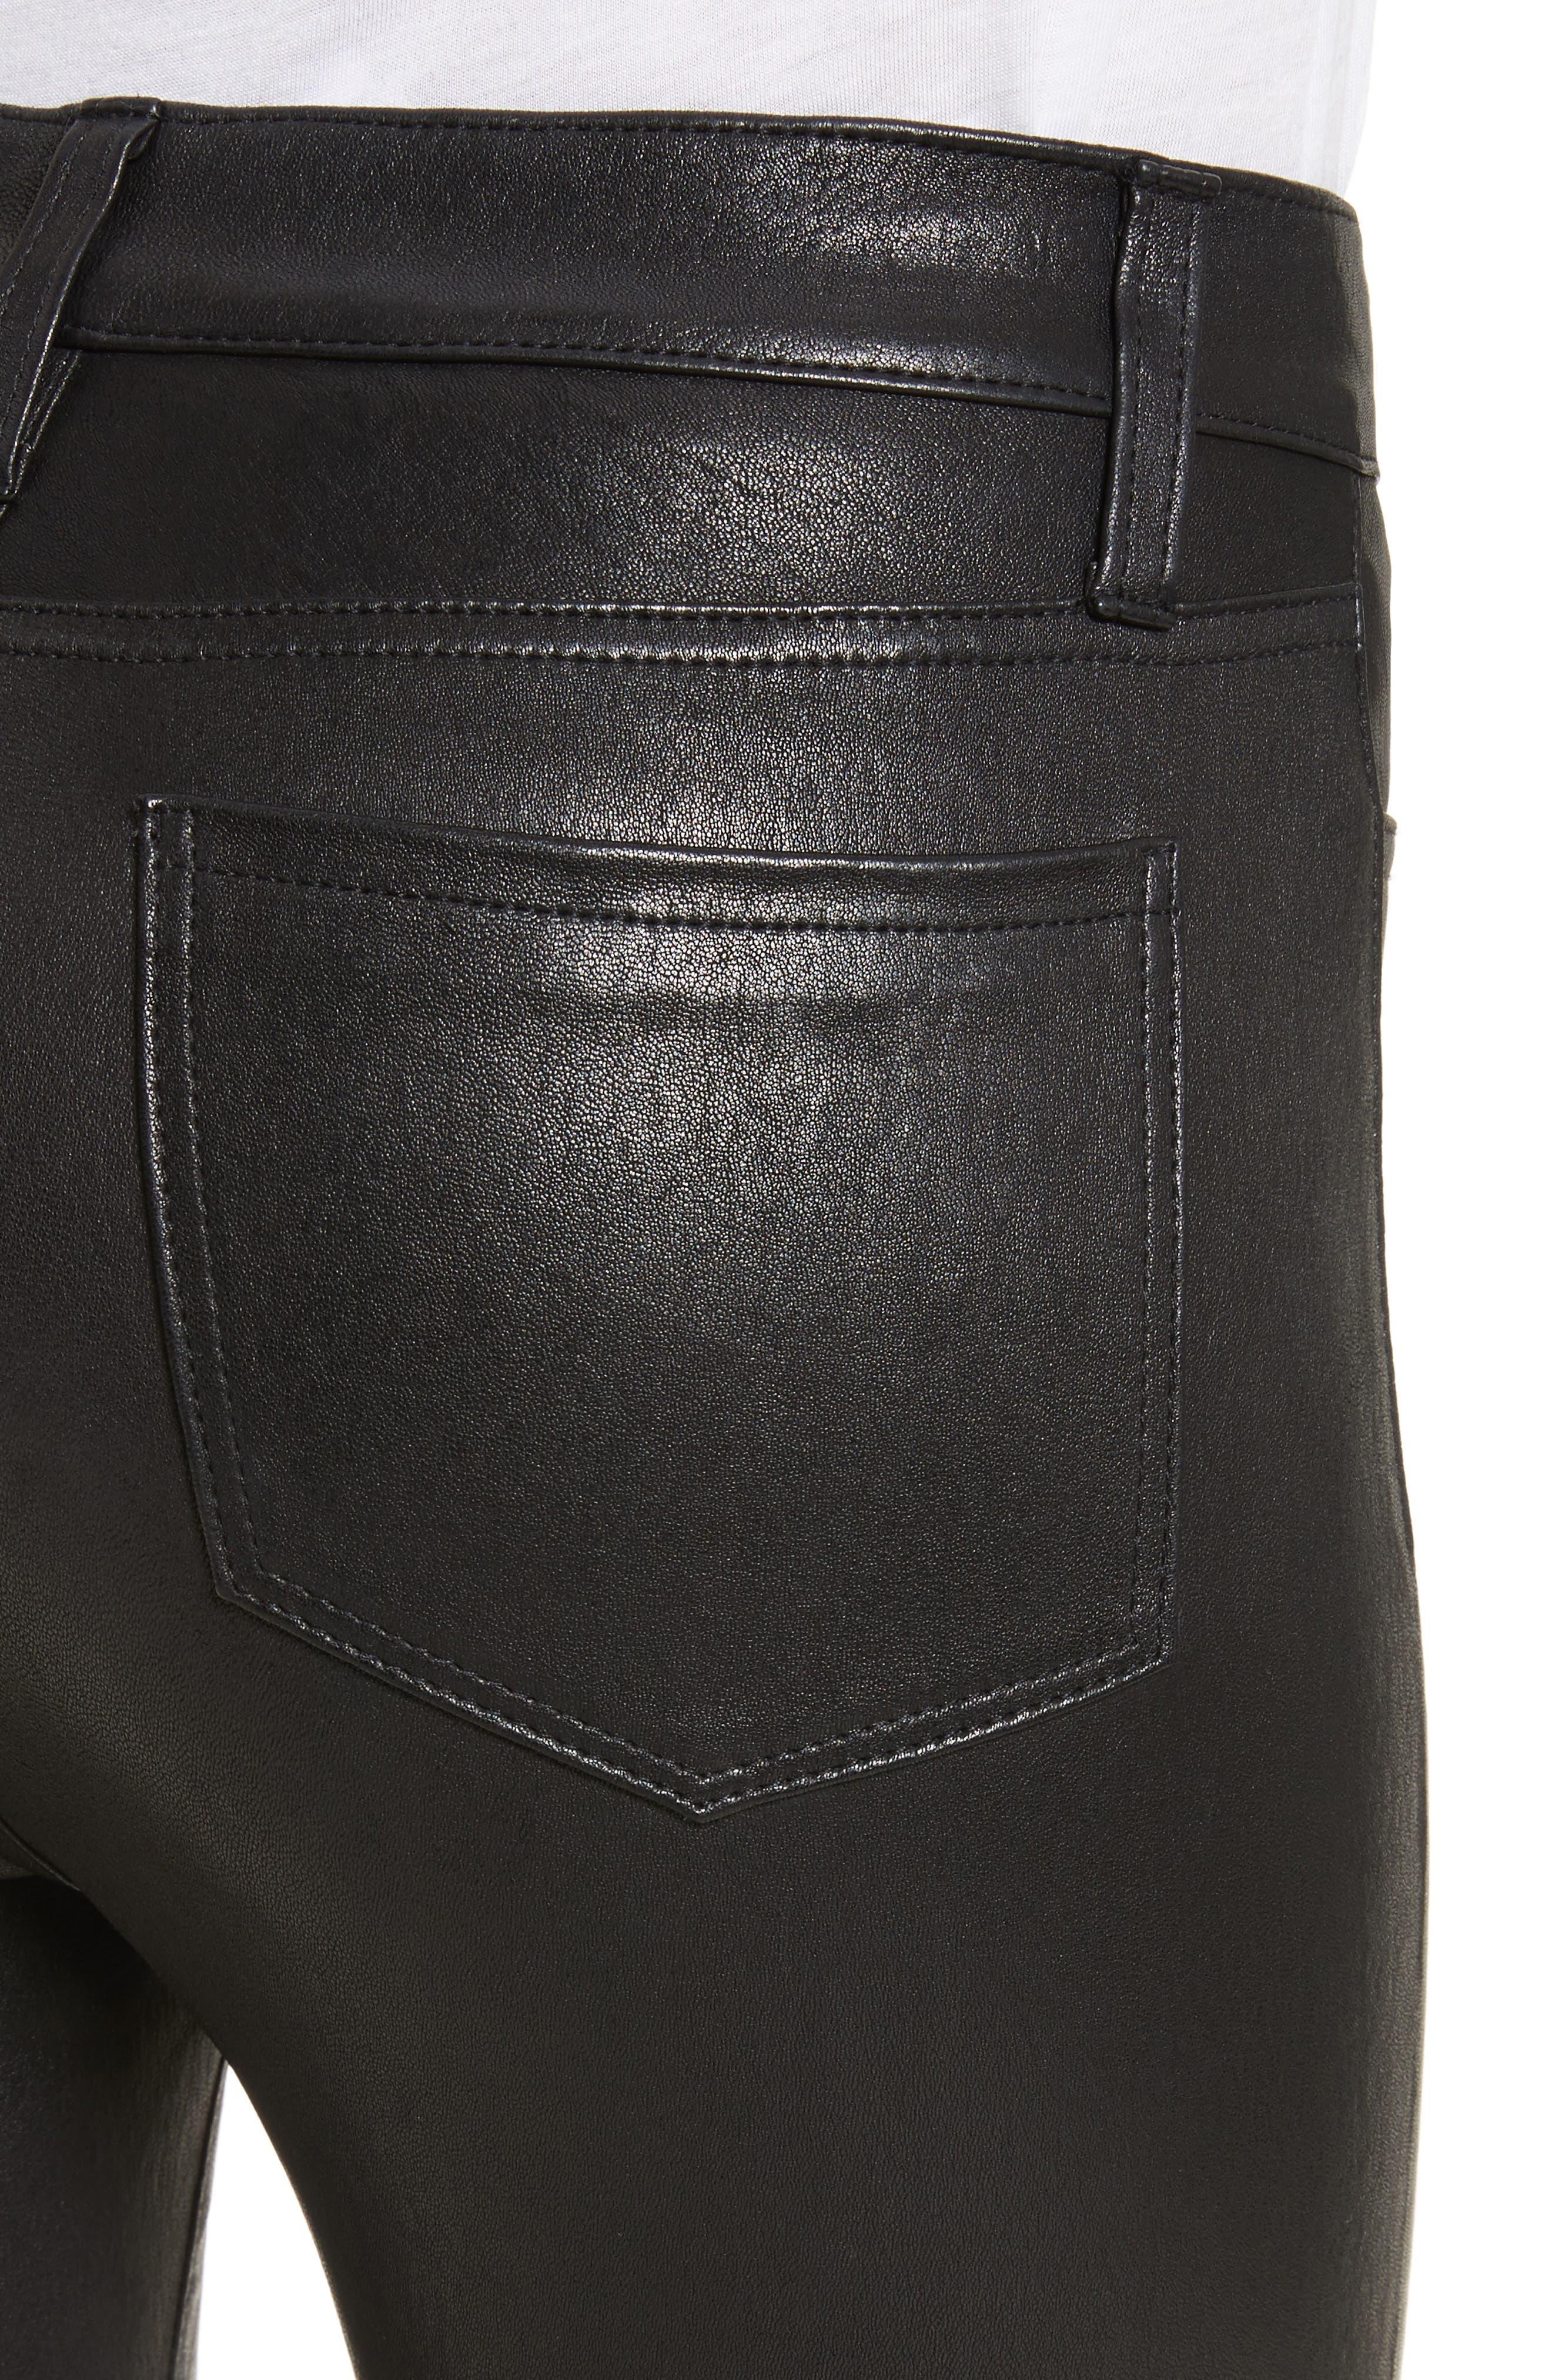 LAGENCE Adelaide High Waist Crop Leather Jeans,                             Alternate thumbnail 4, color,                             Noir